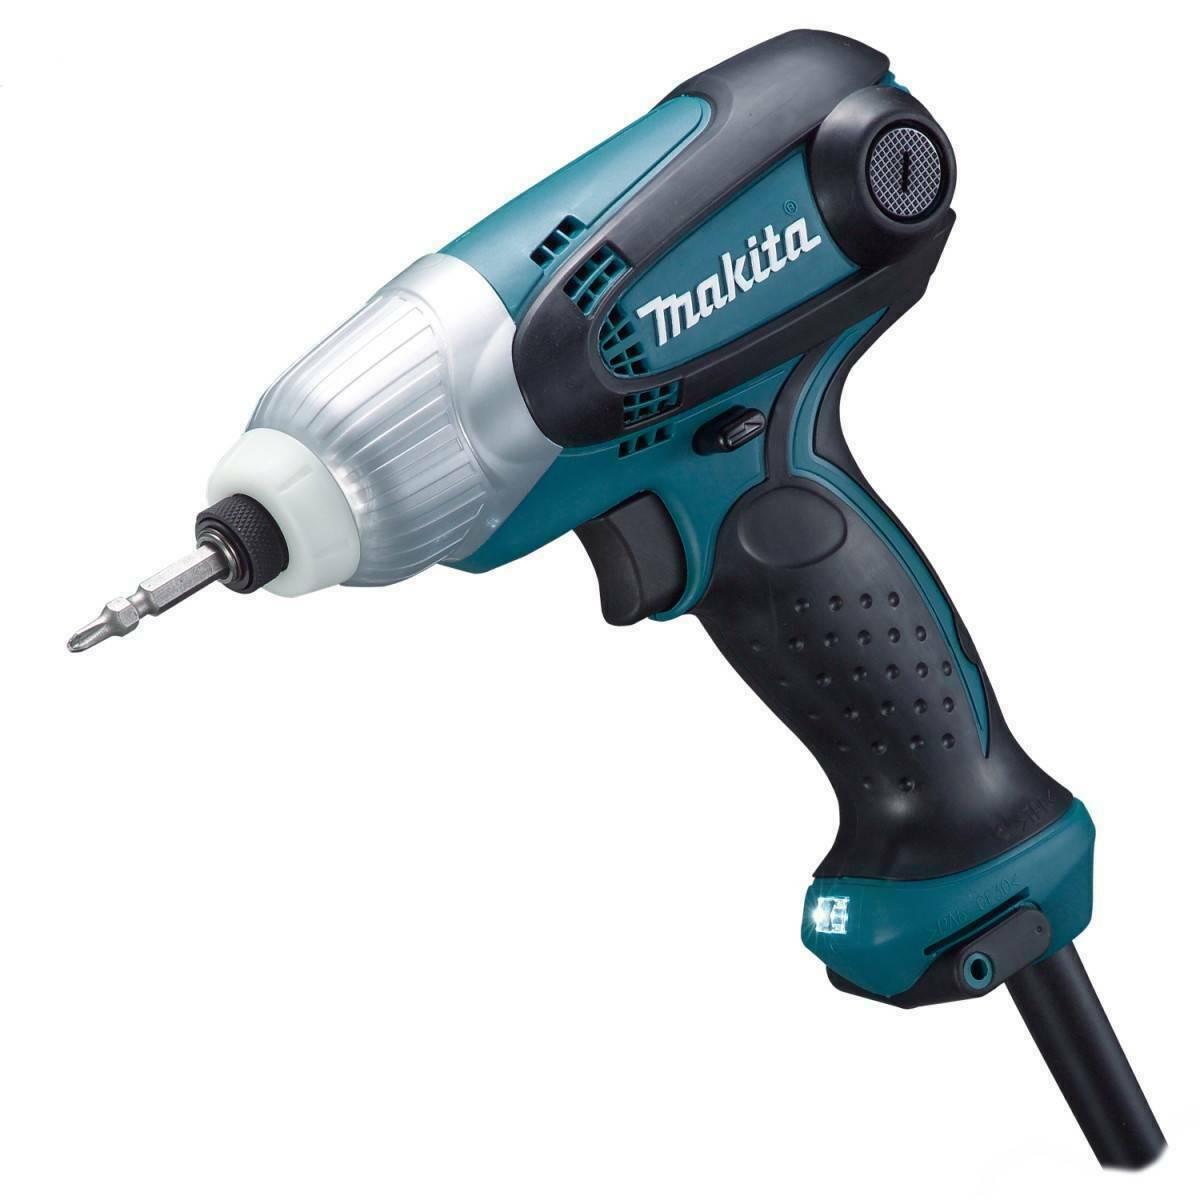 Makita TD0101F Electric Impact Driver Hand Tool 220V 100Nm